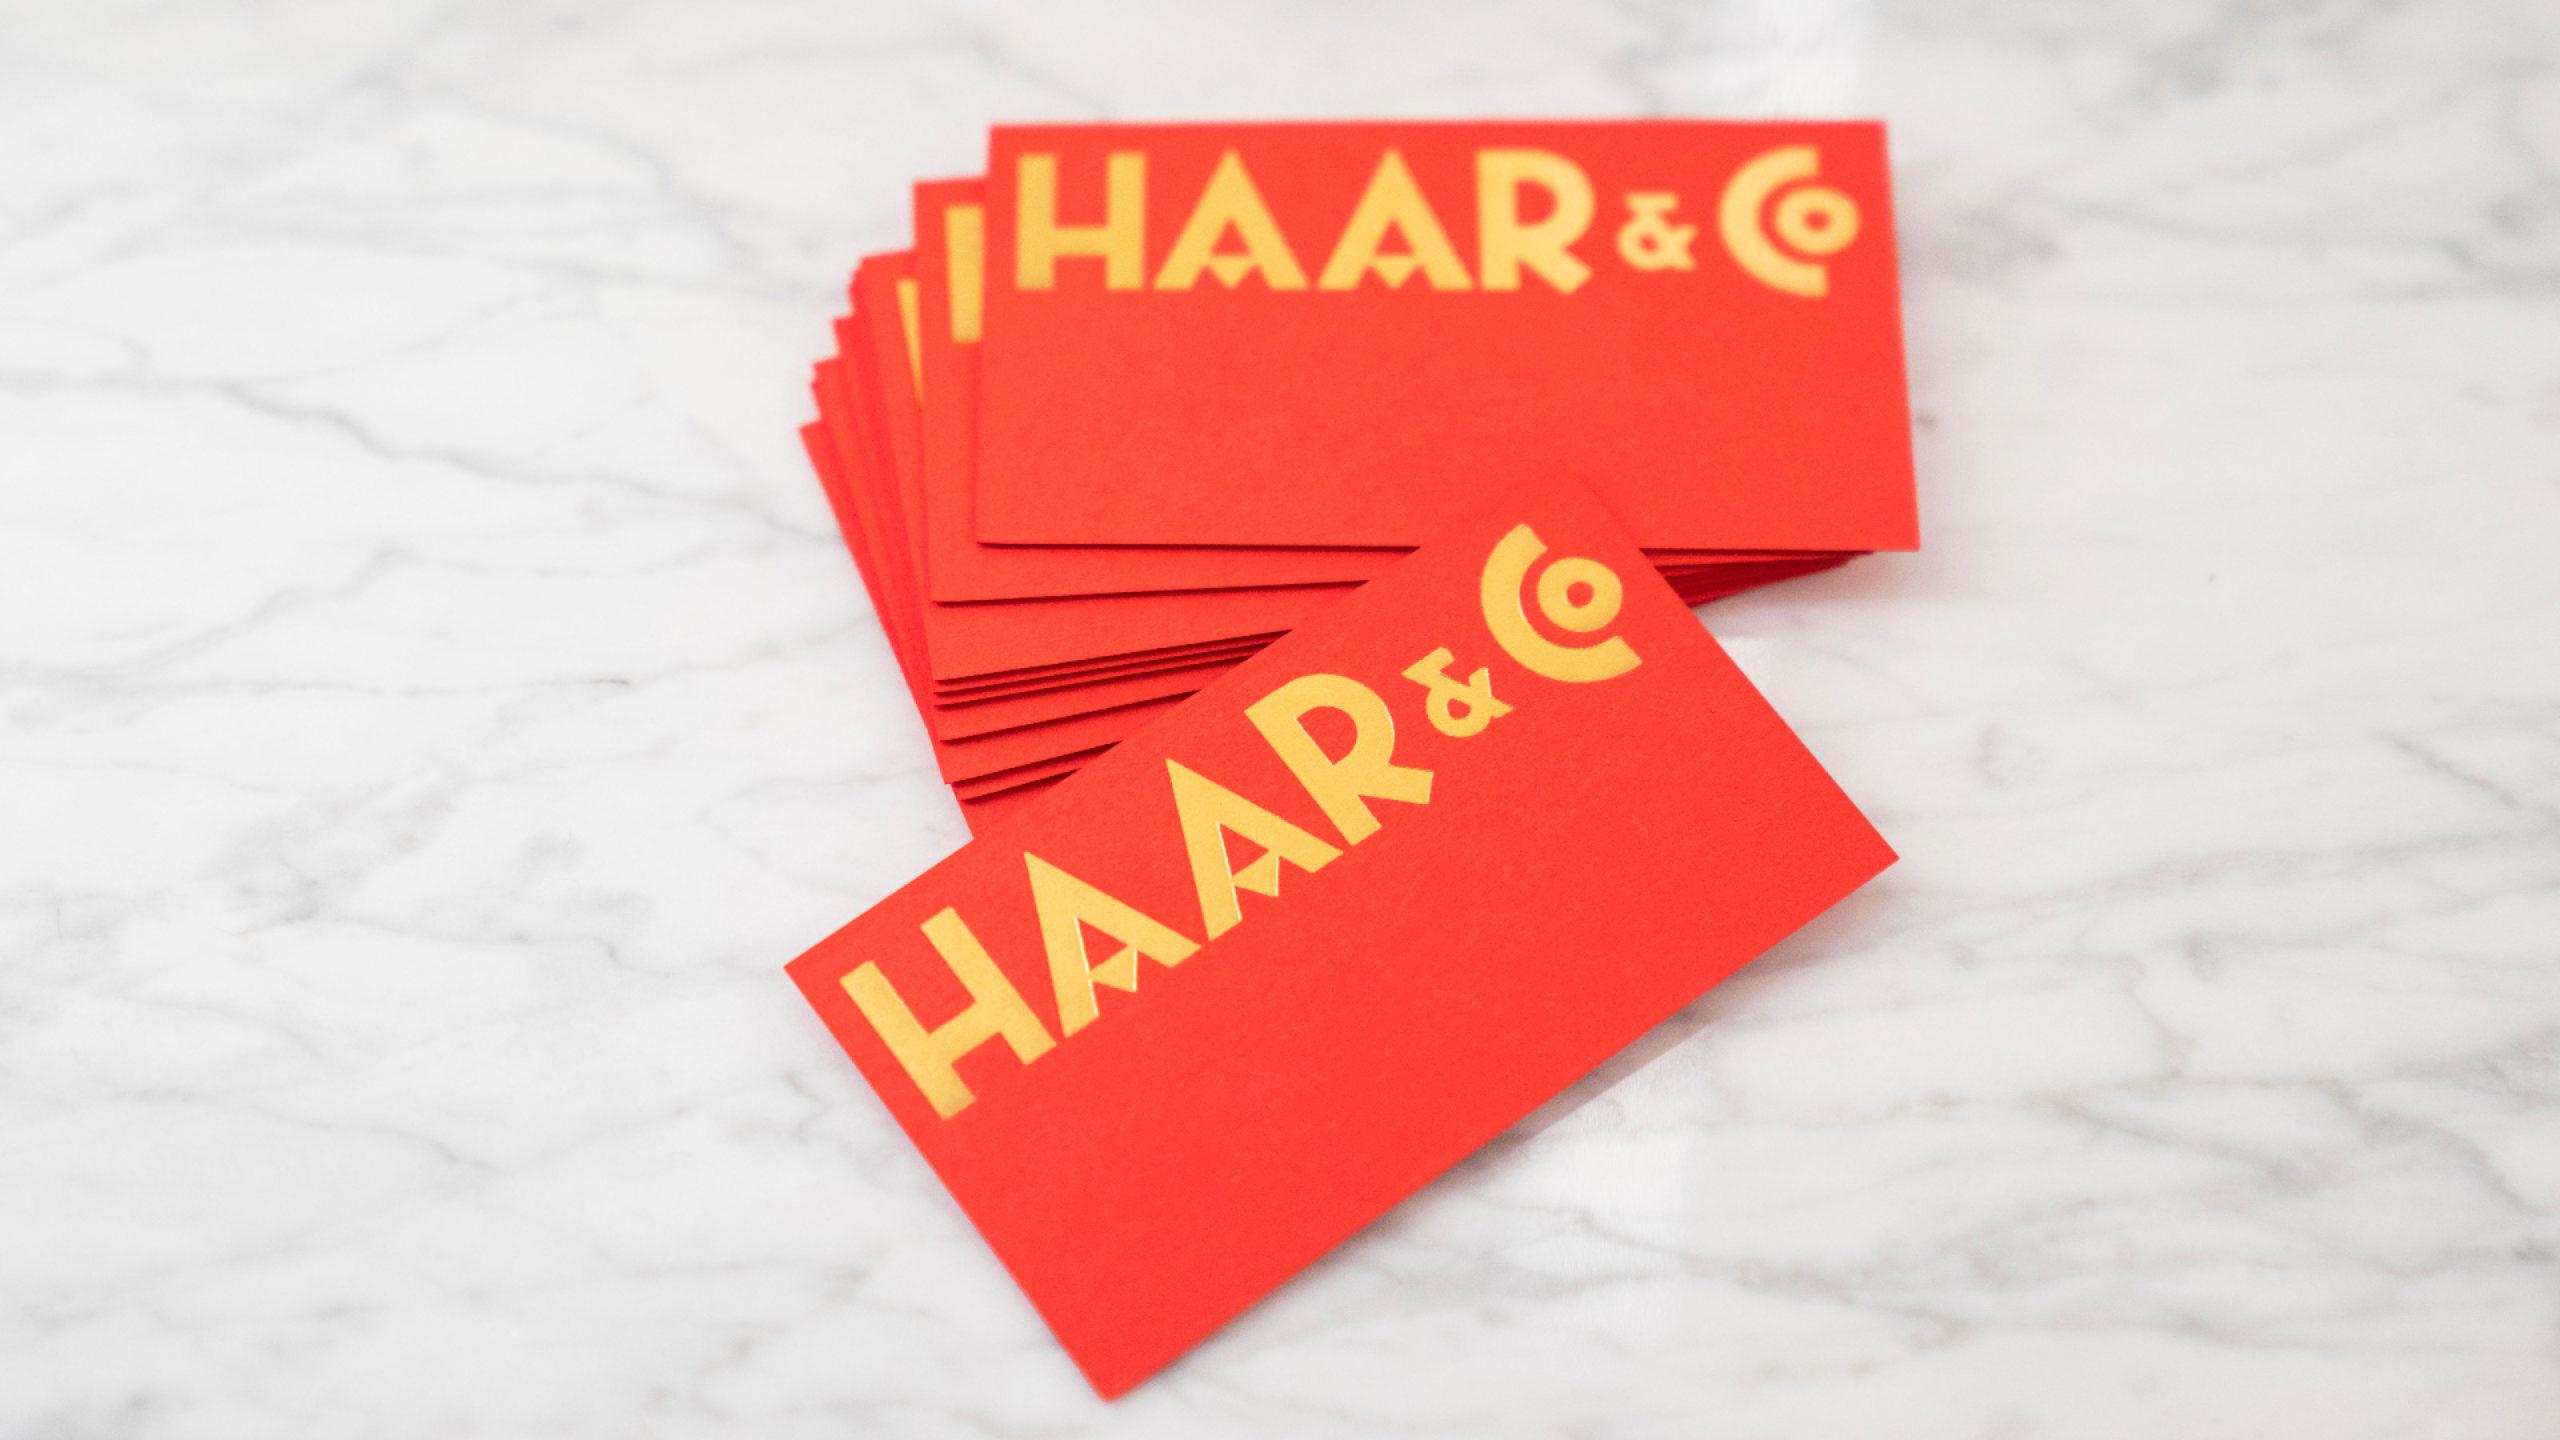 Haar&Co logo and business card